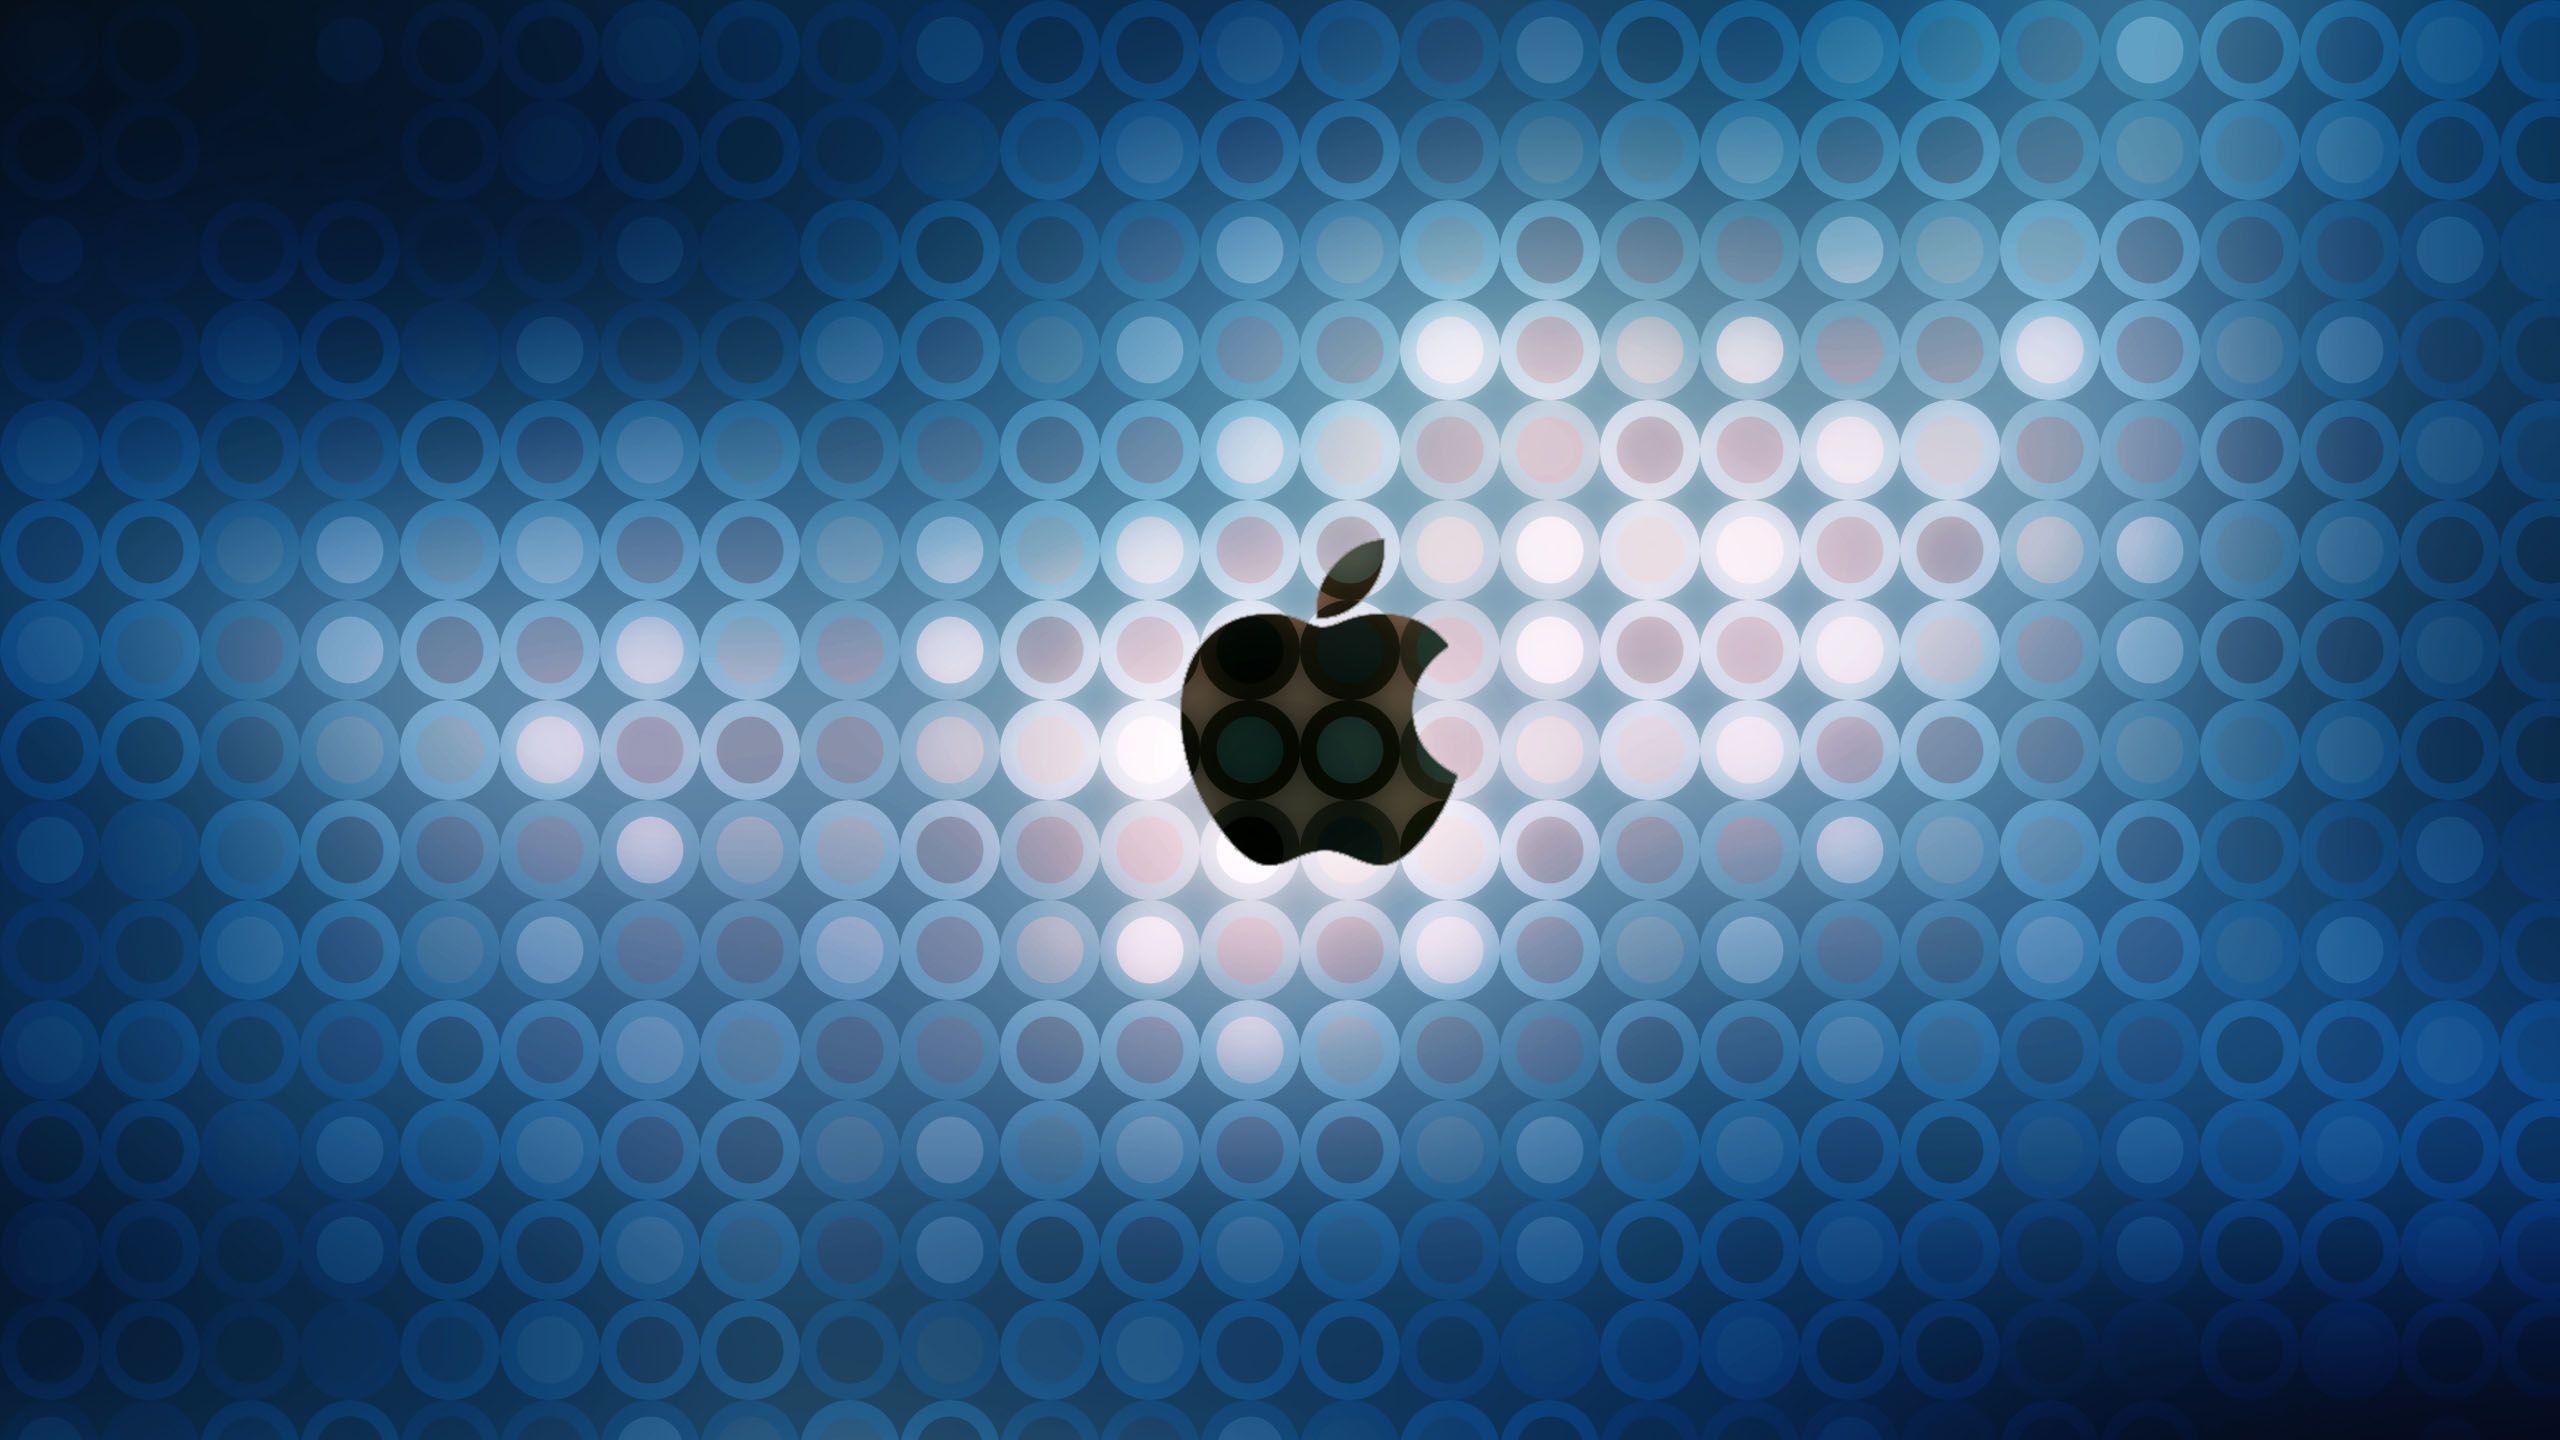 mac desktop wallpaper hd full hd 1080p best hd mac hd